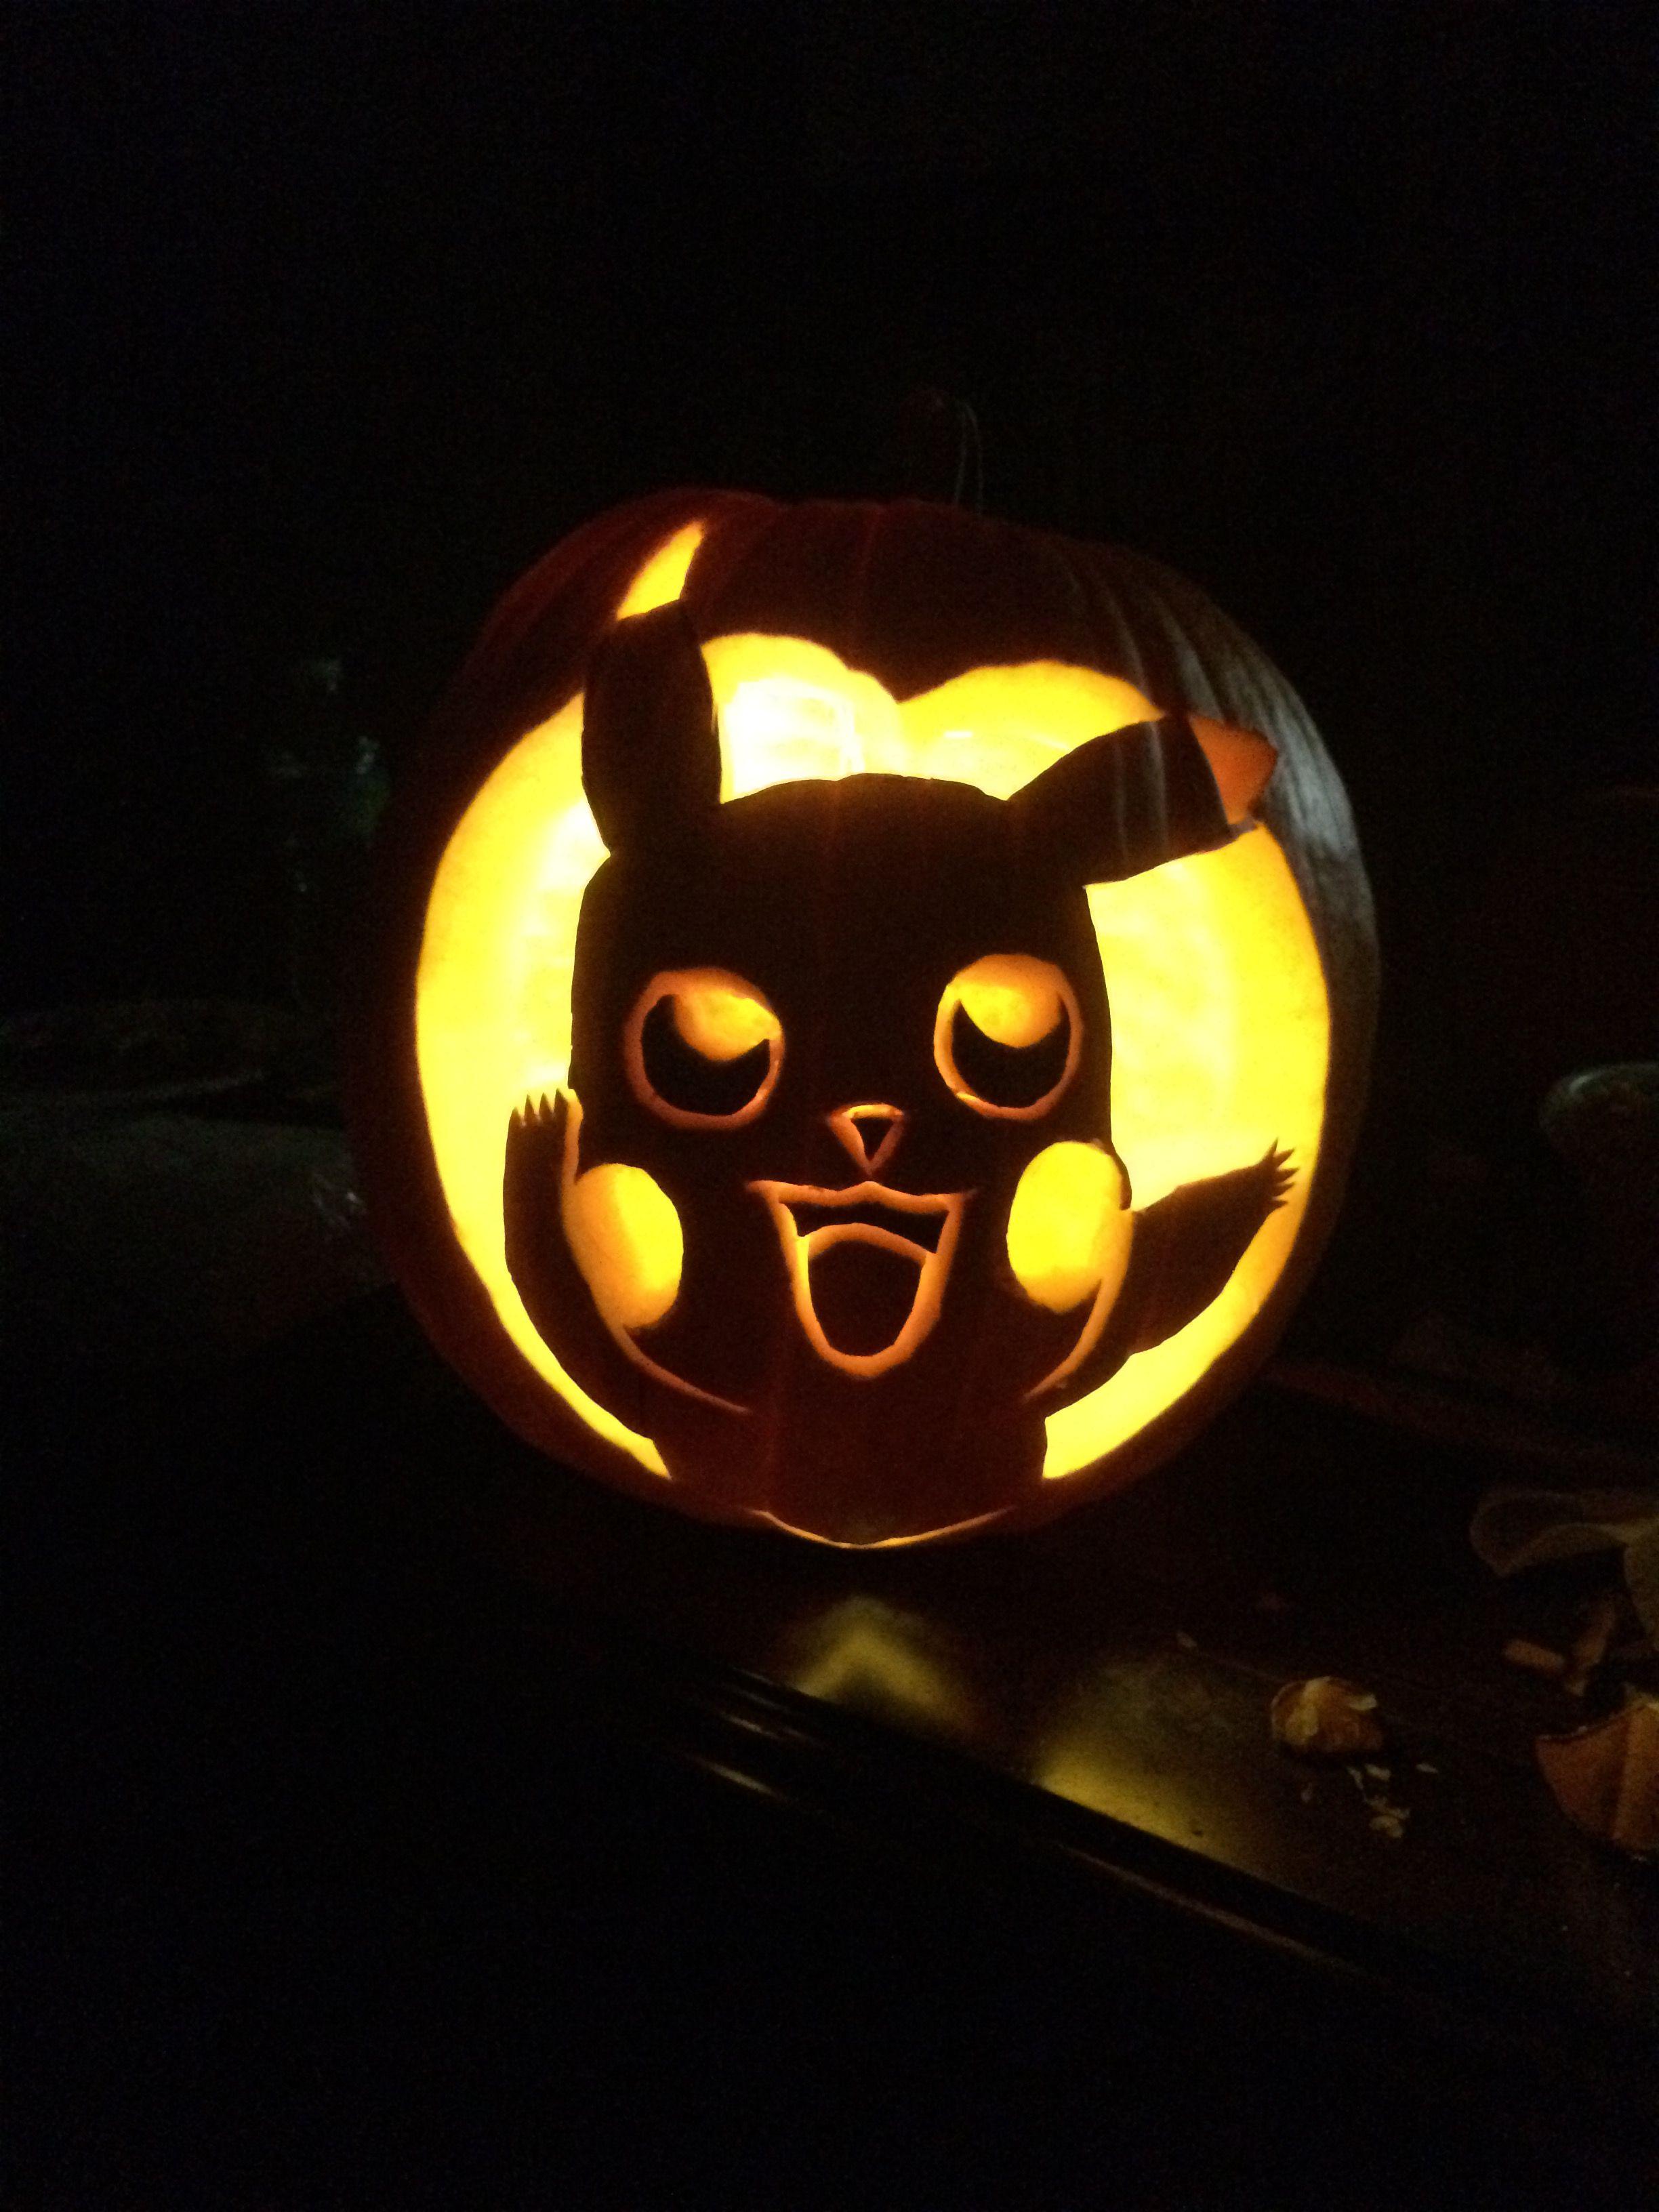 Pikachu Pumpkin My Fianc Did Freehanded